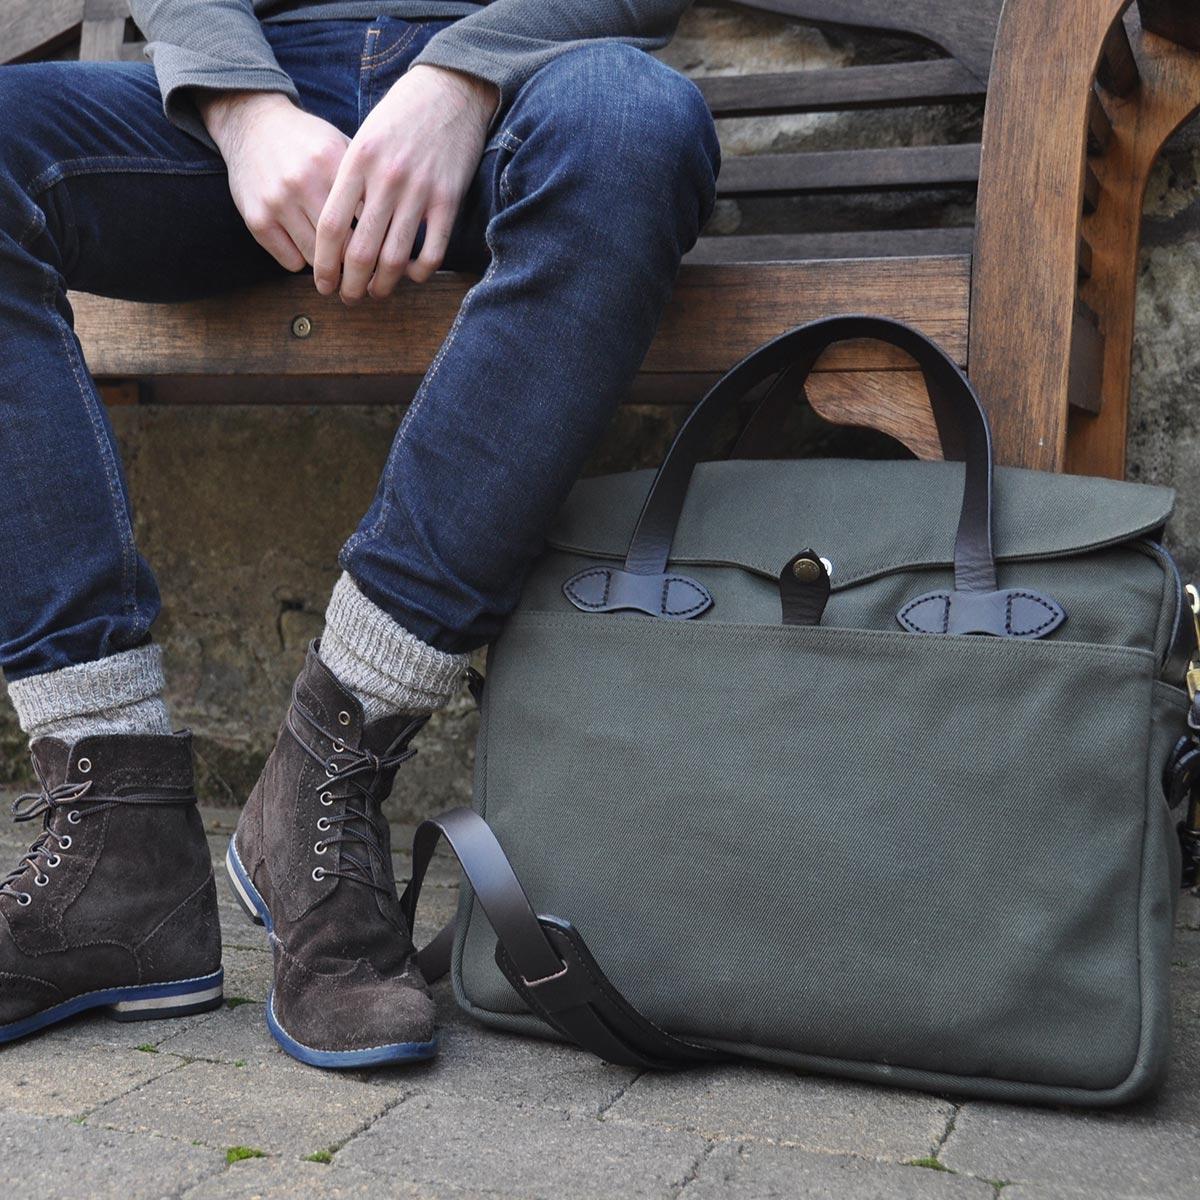 Filson Original Briefcase 11070256 Otter Green streetwear, lifestyle